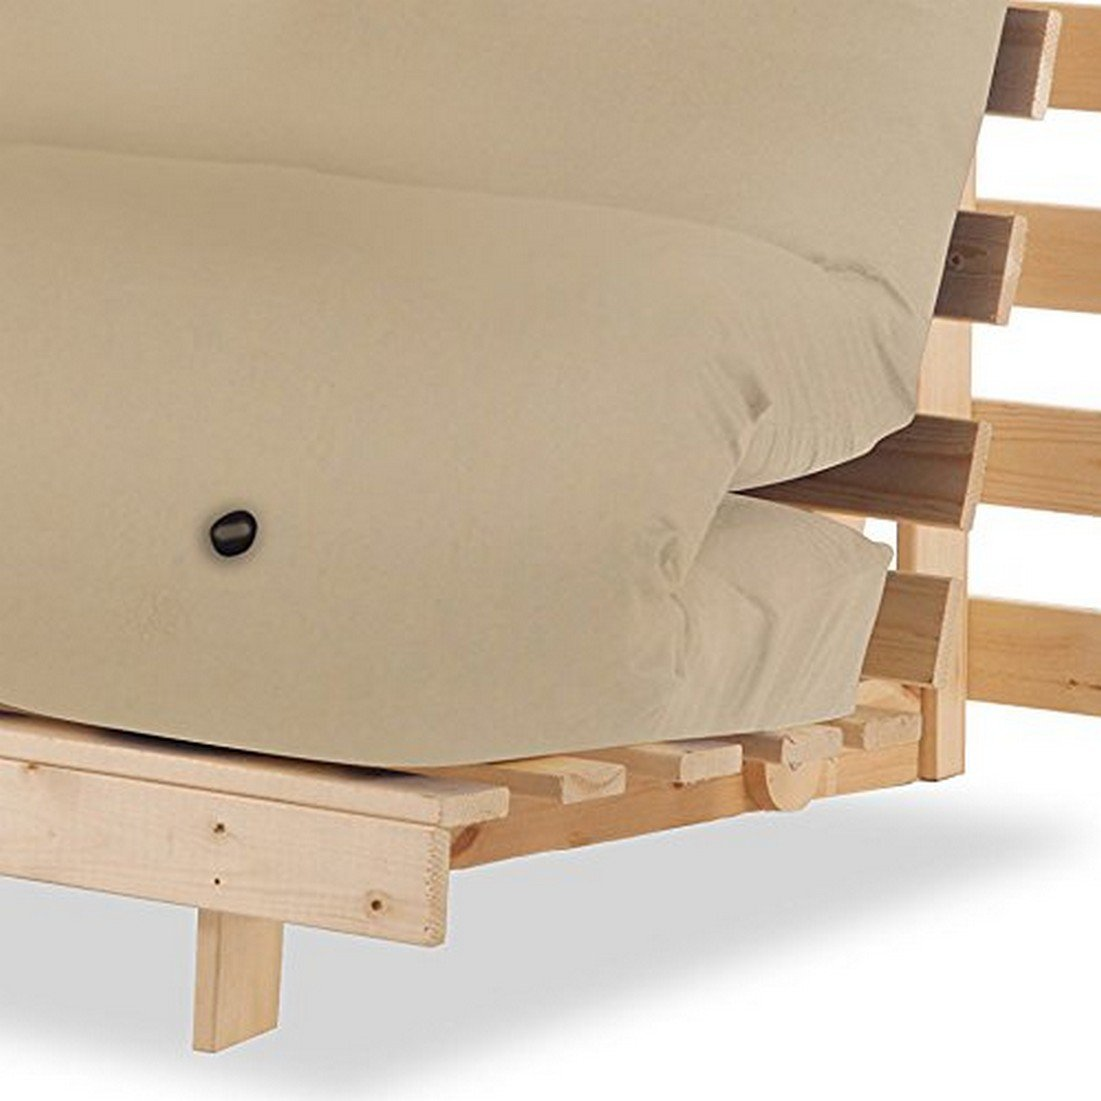 Black Humza Amani Wood Luxury 1 Seater Metro Futon Sofa Bed Frame with Futon Mattress Set